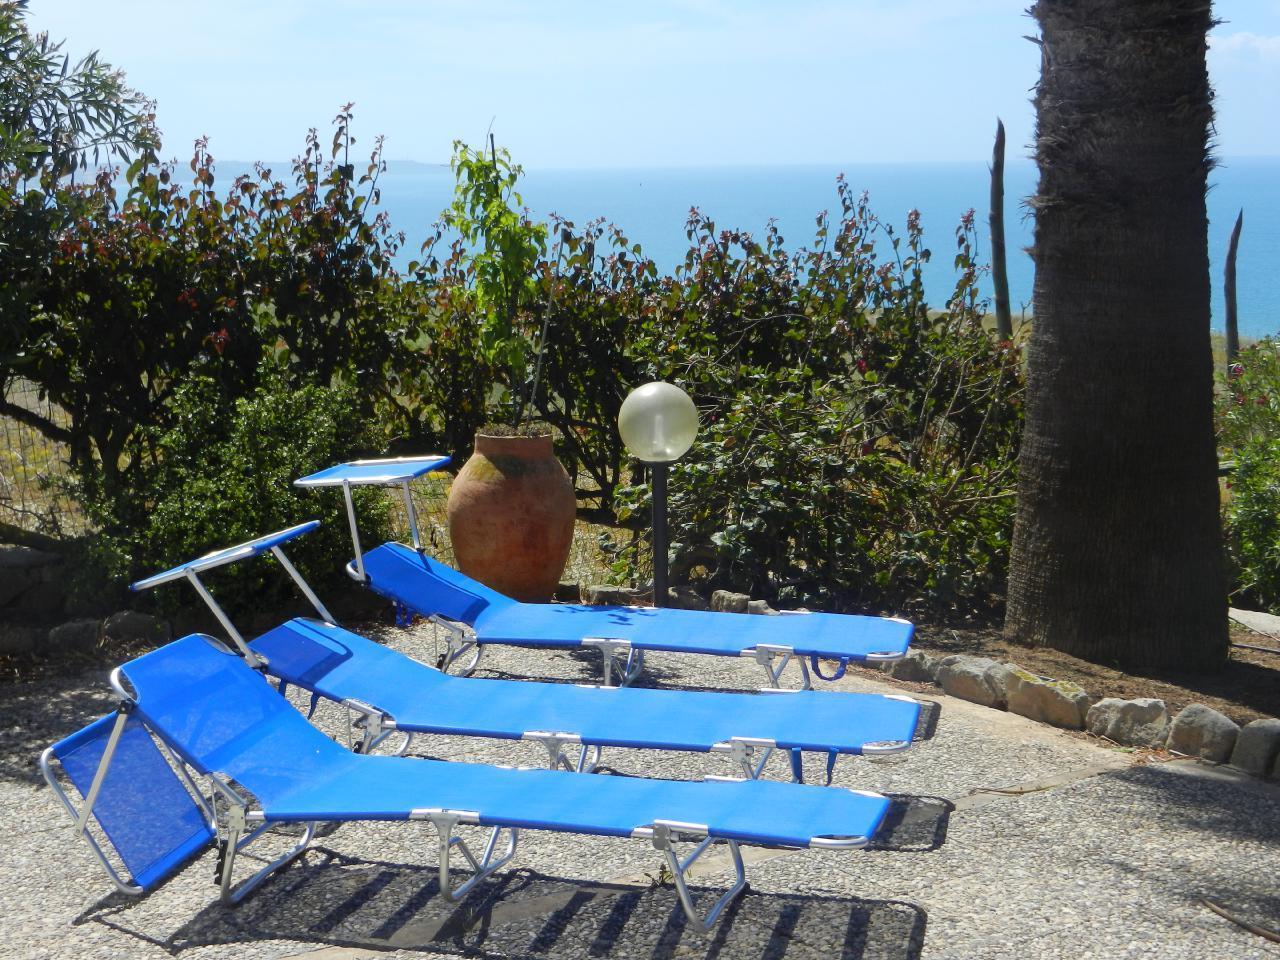 Maison de vacances Villa Mediterranea (57184), Menfi, Agrigento, Sicile, Italie, image 27